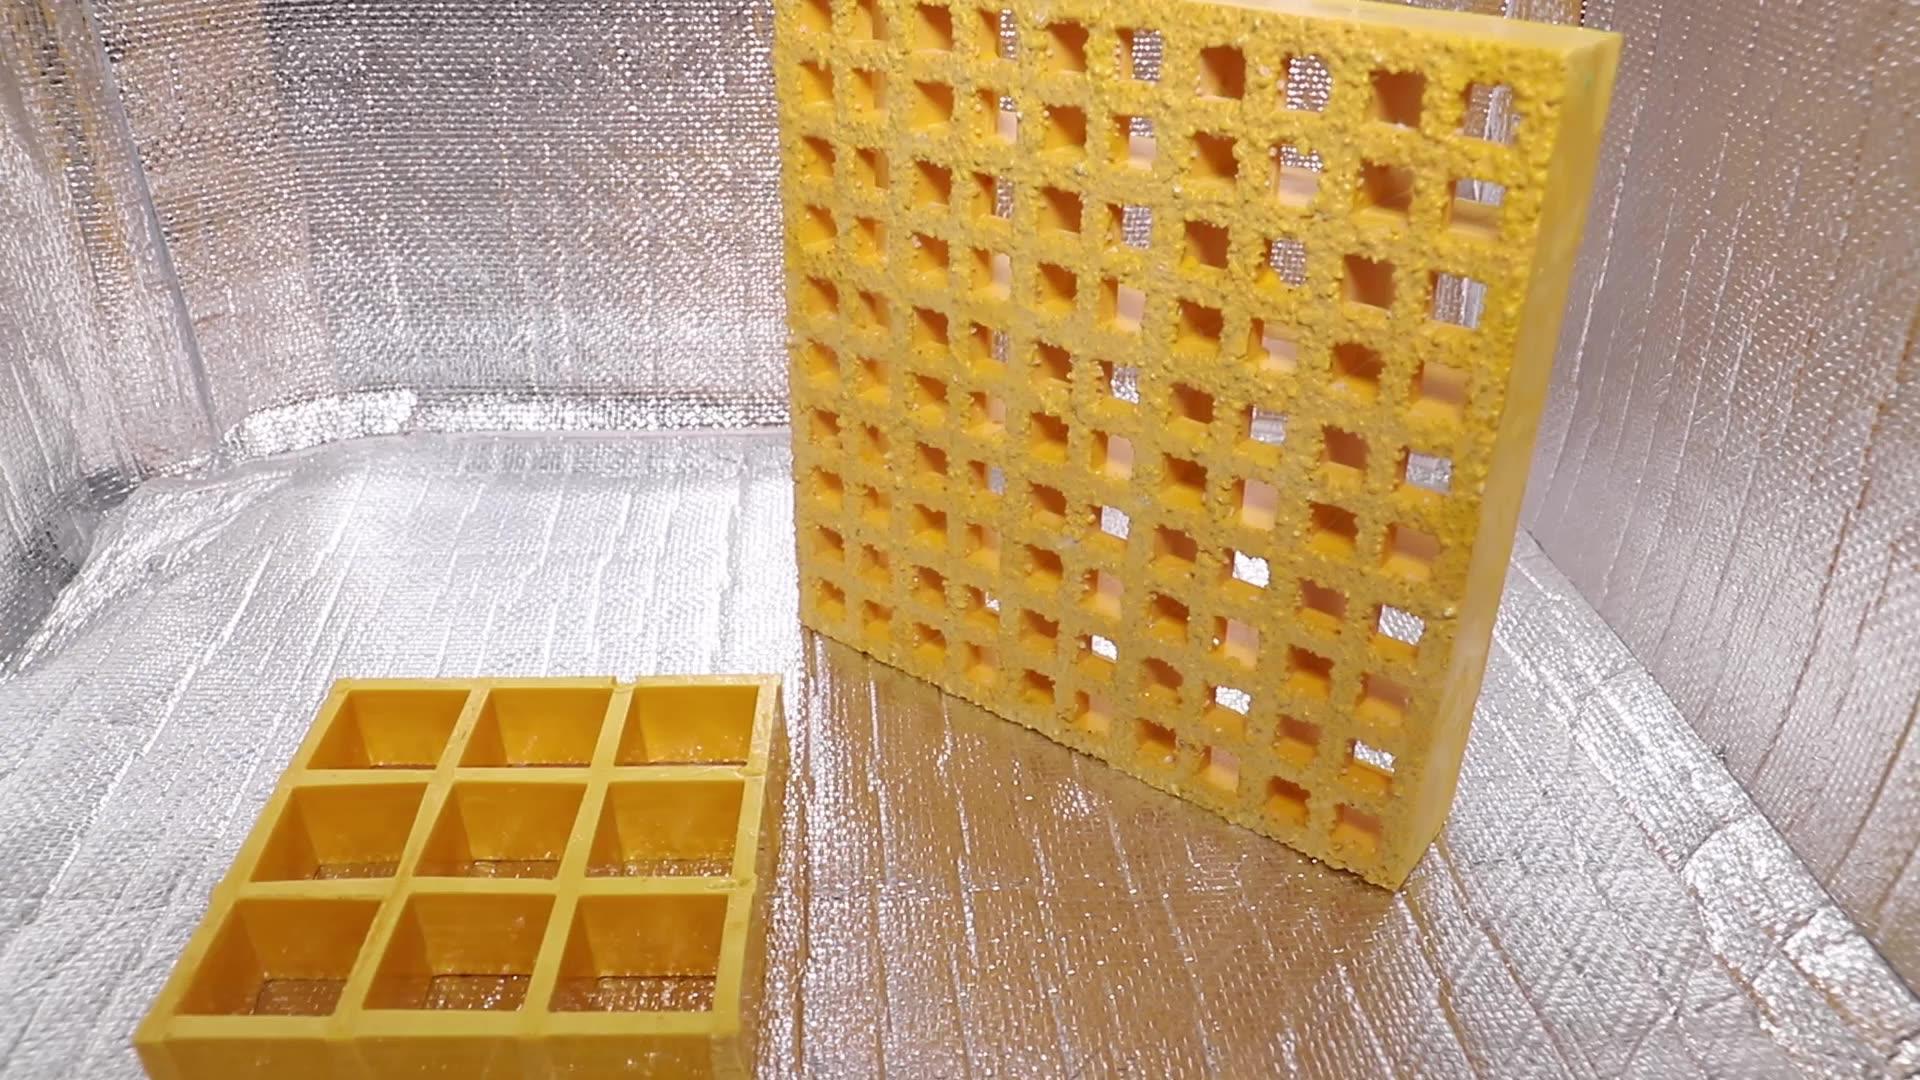 De alta resistencia de malla duradera pasarela de fibra de vidrio Frp rejilla